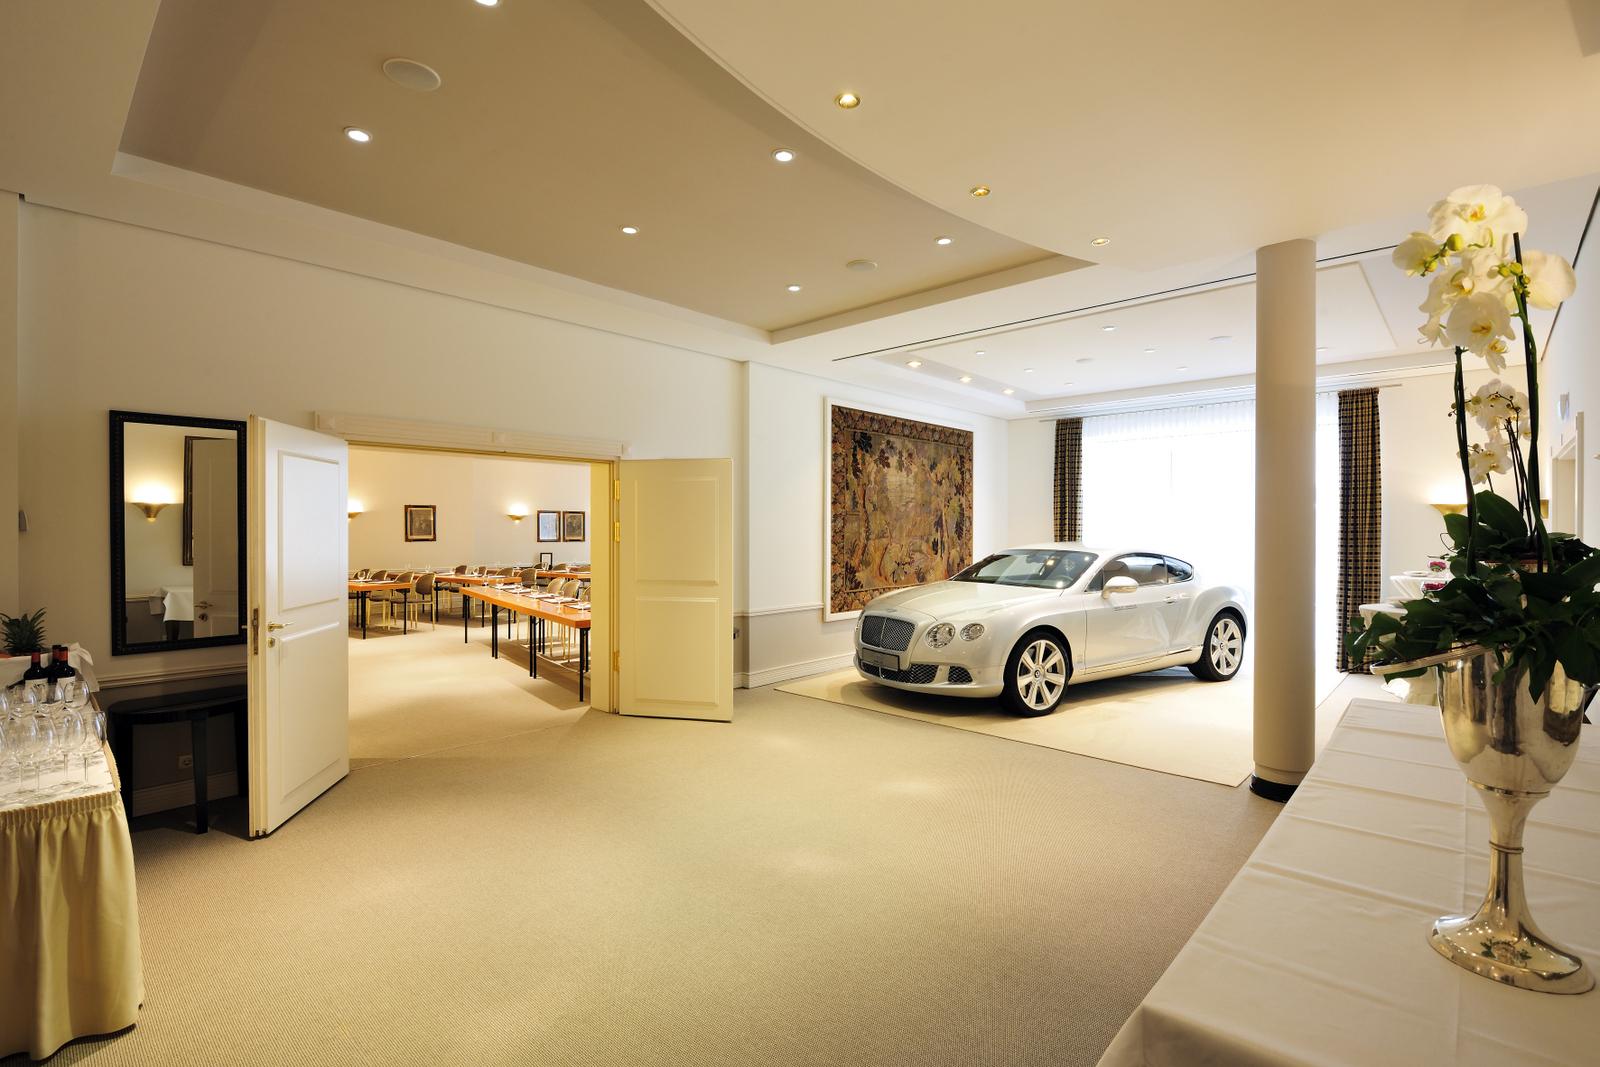 gobelinsaal mit foyer kastens hotel luisenhof. Black Bedroom Furniture Sets. Home Design Ideas